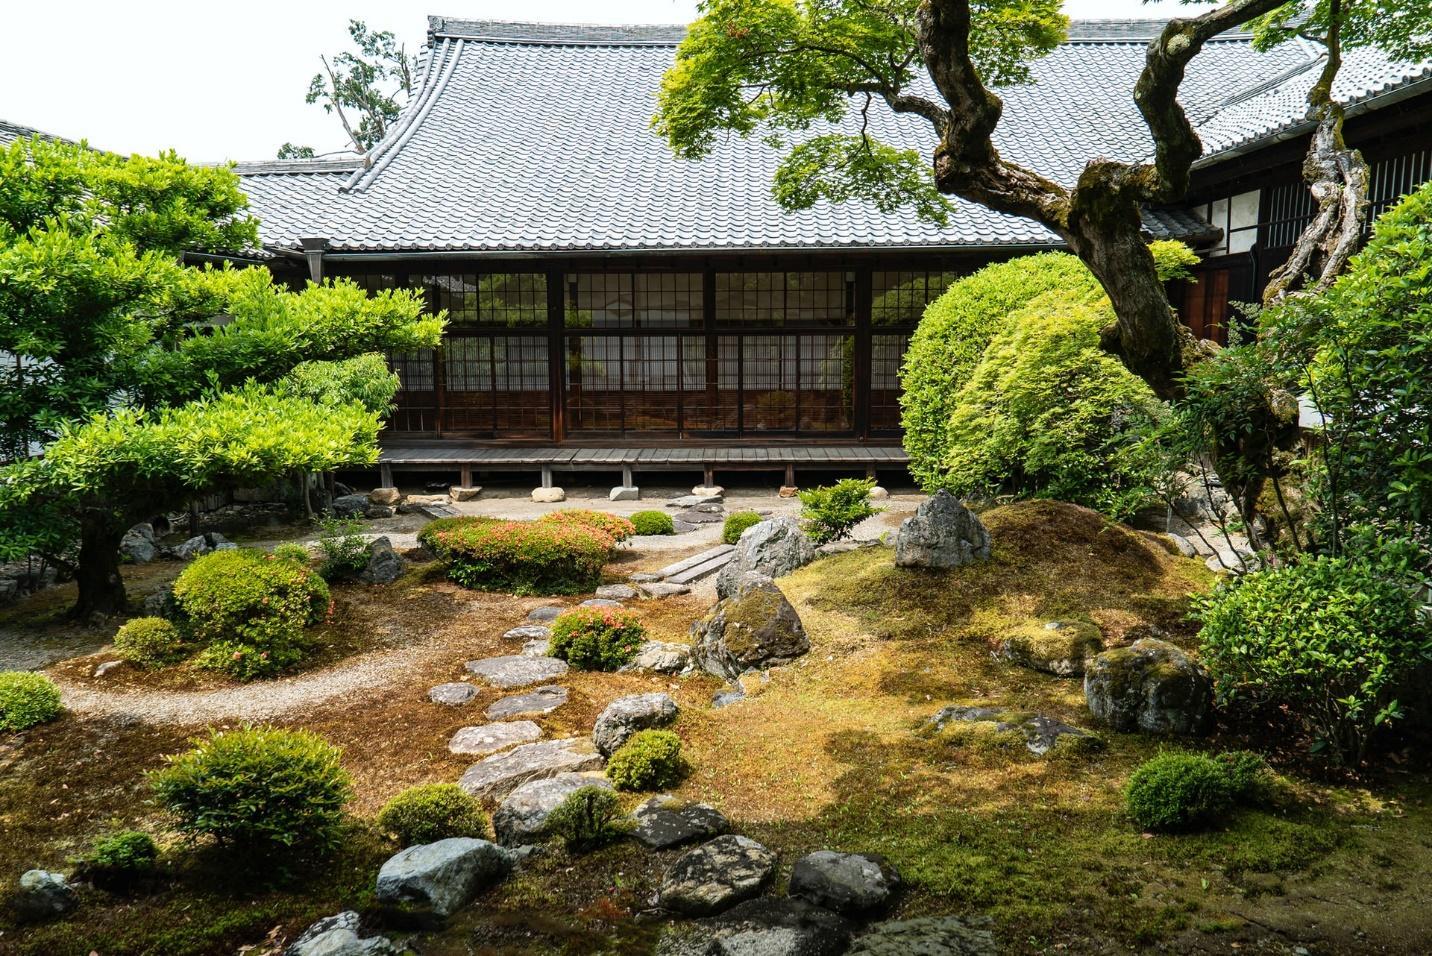 Inspirasi Taman Jepang Bagi Penyuka Desain Minimalis